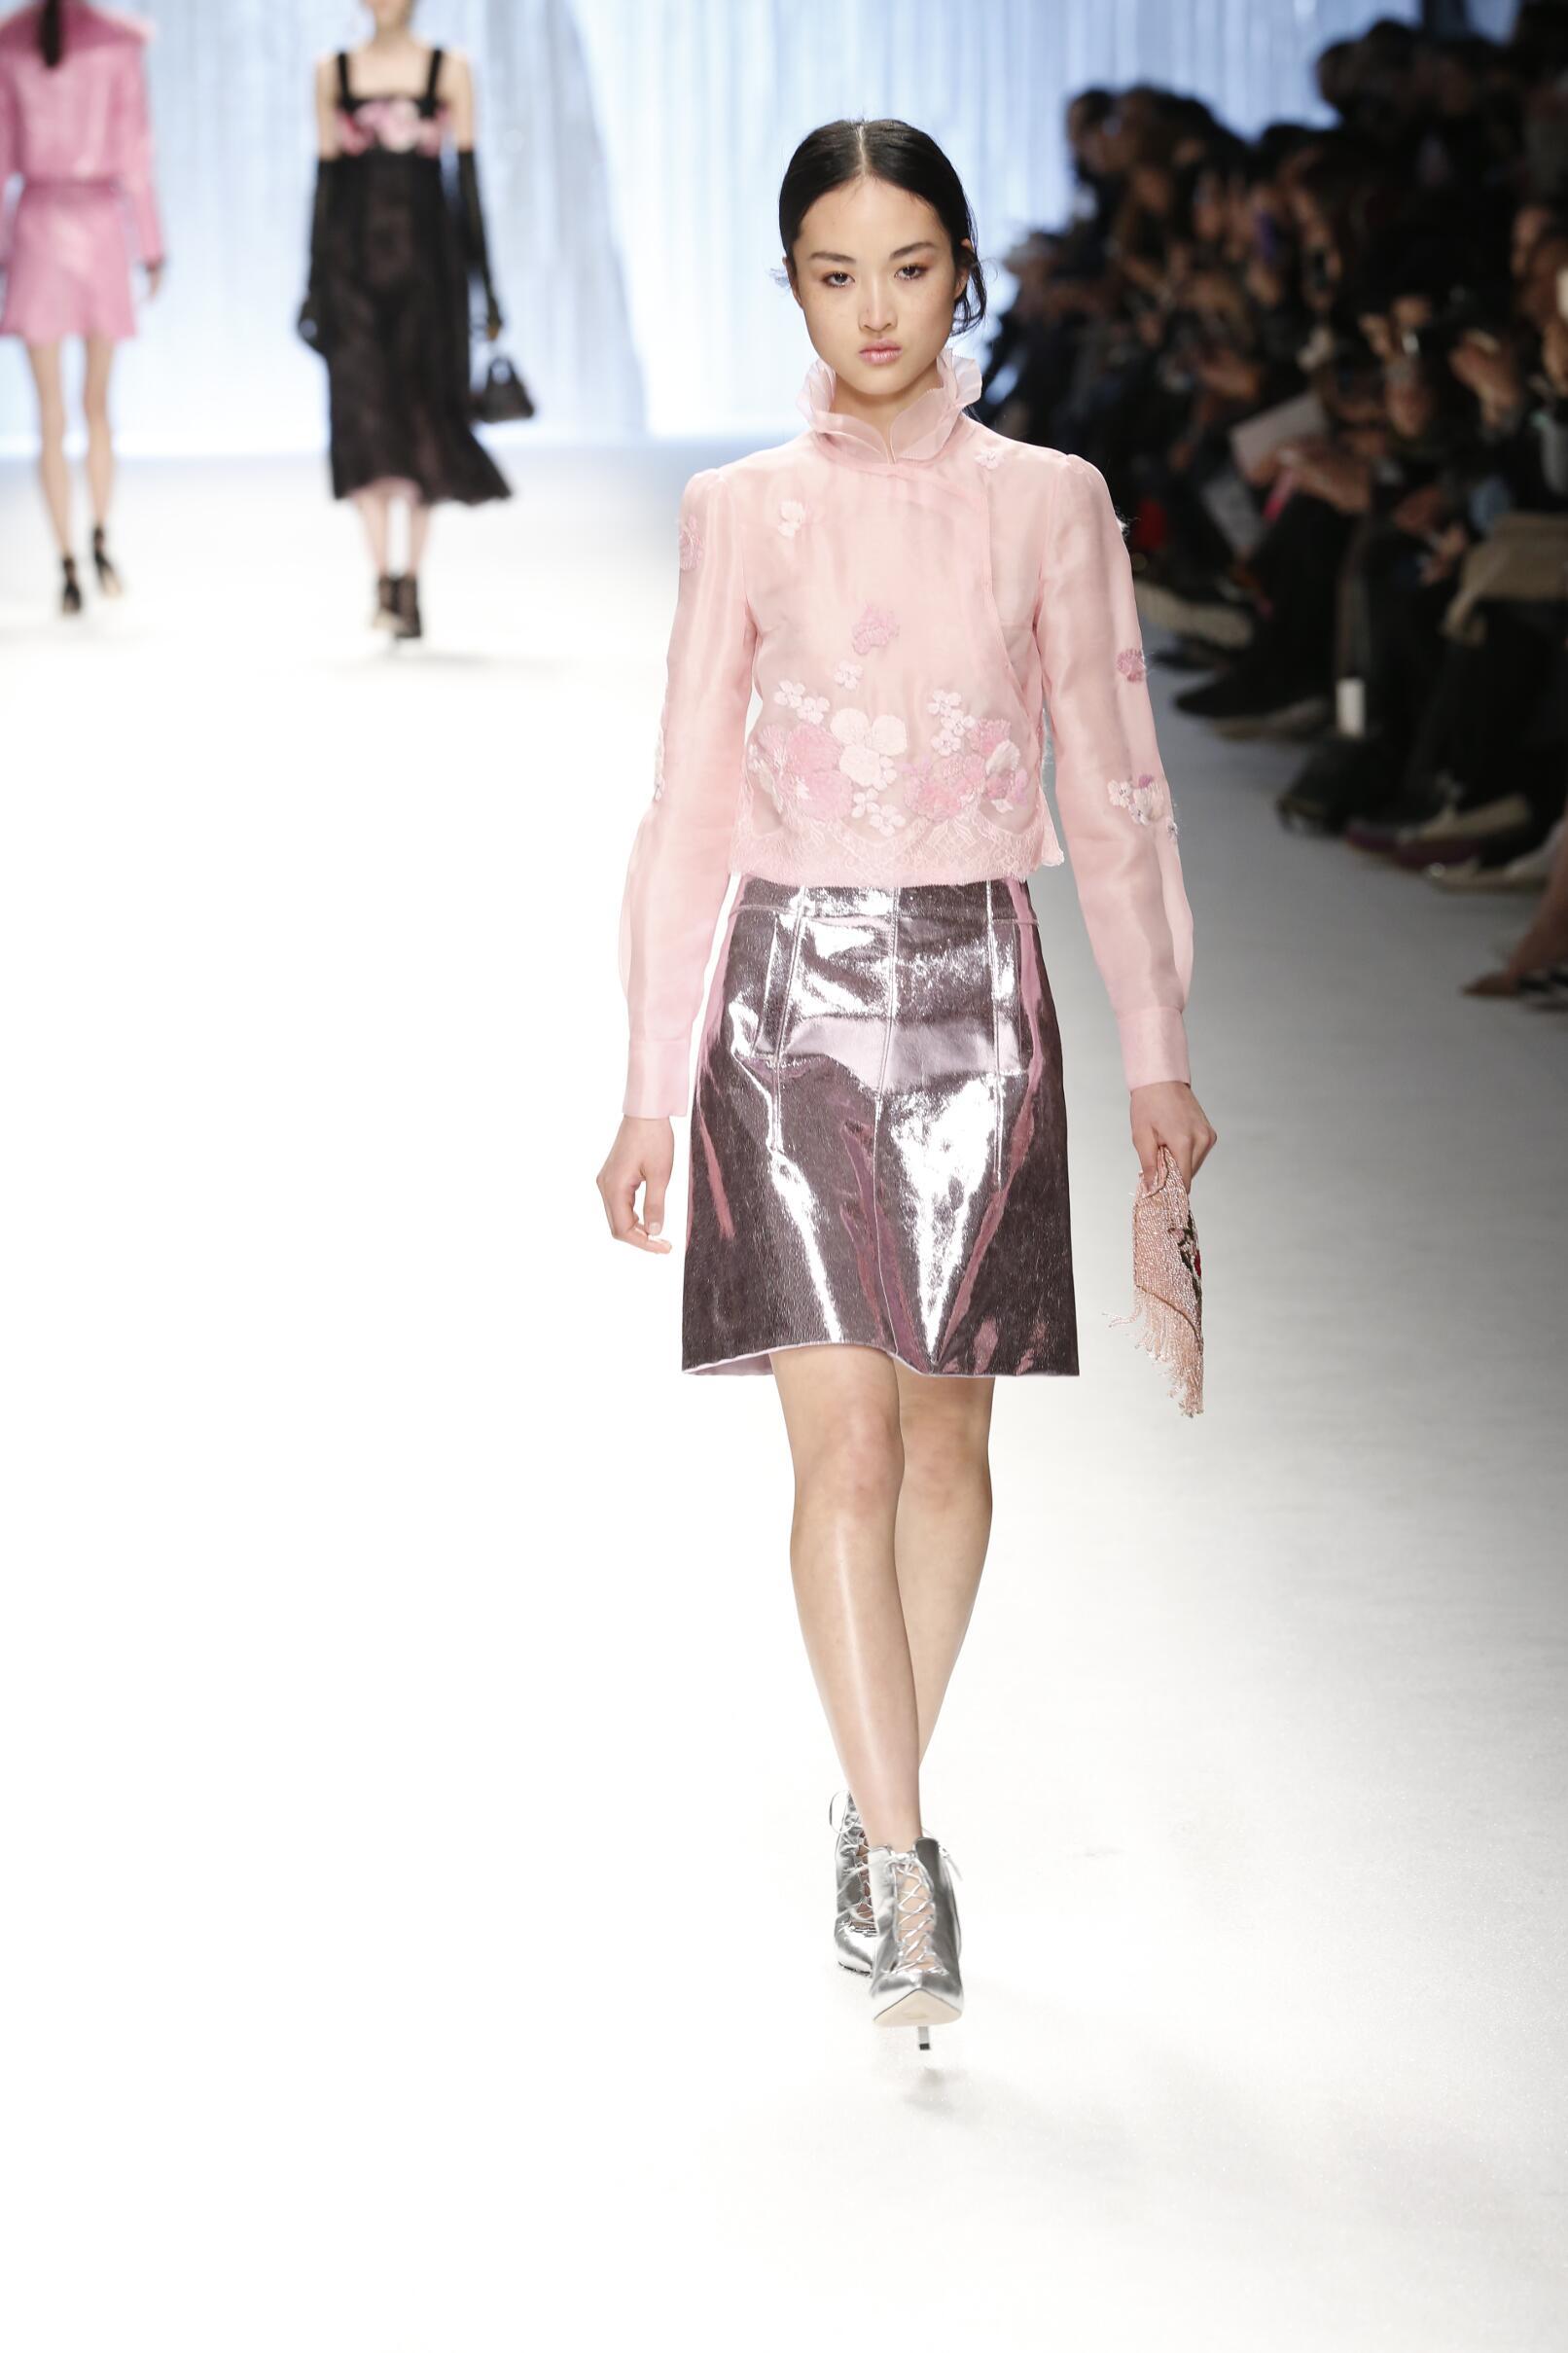 Shiatzy Chen Fall Winter 2015 16 Womenswear Collection Paris Fashion Week Fashion Show